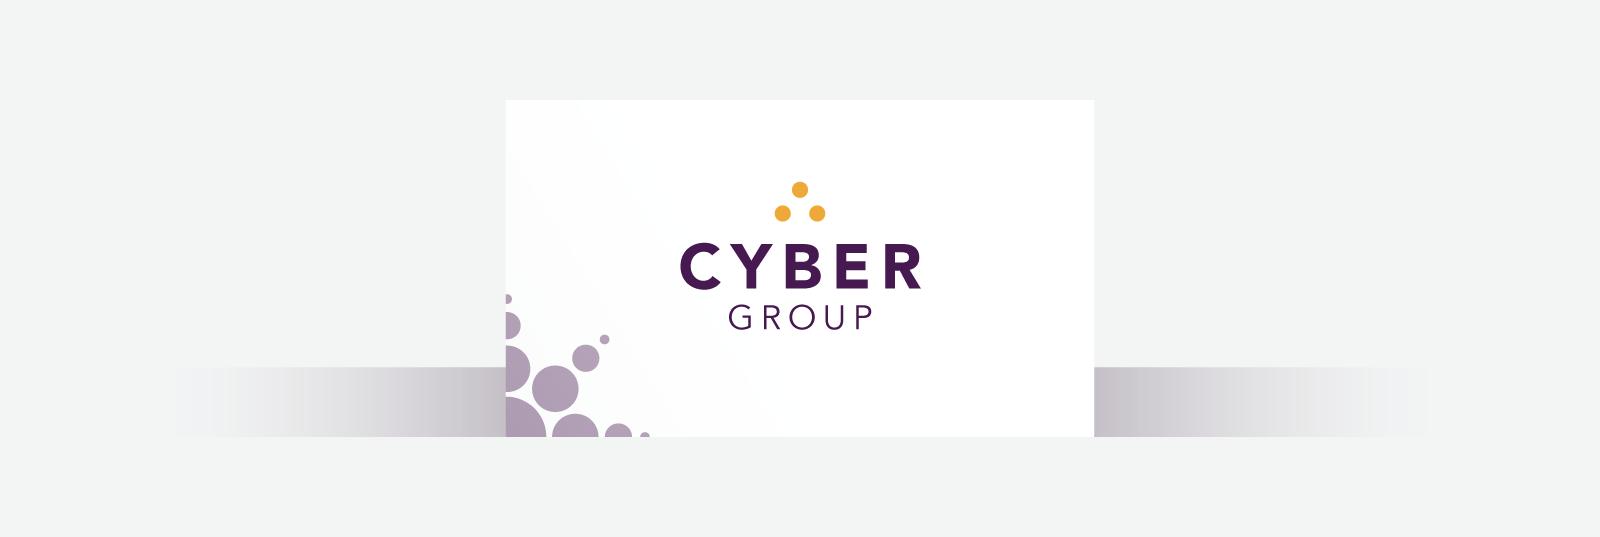 White business card with a dark purple sans serif font